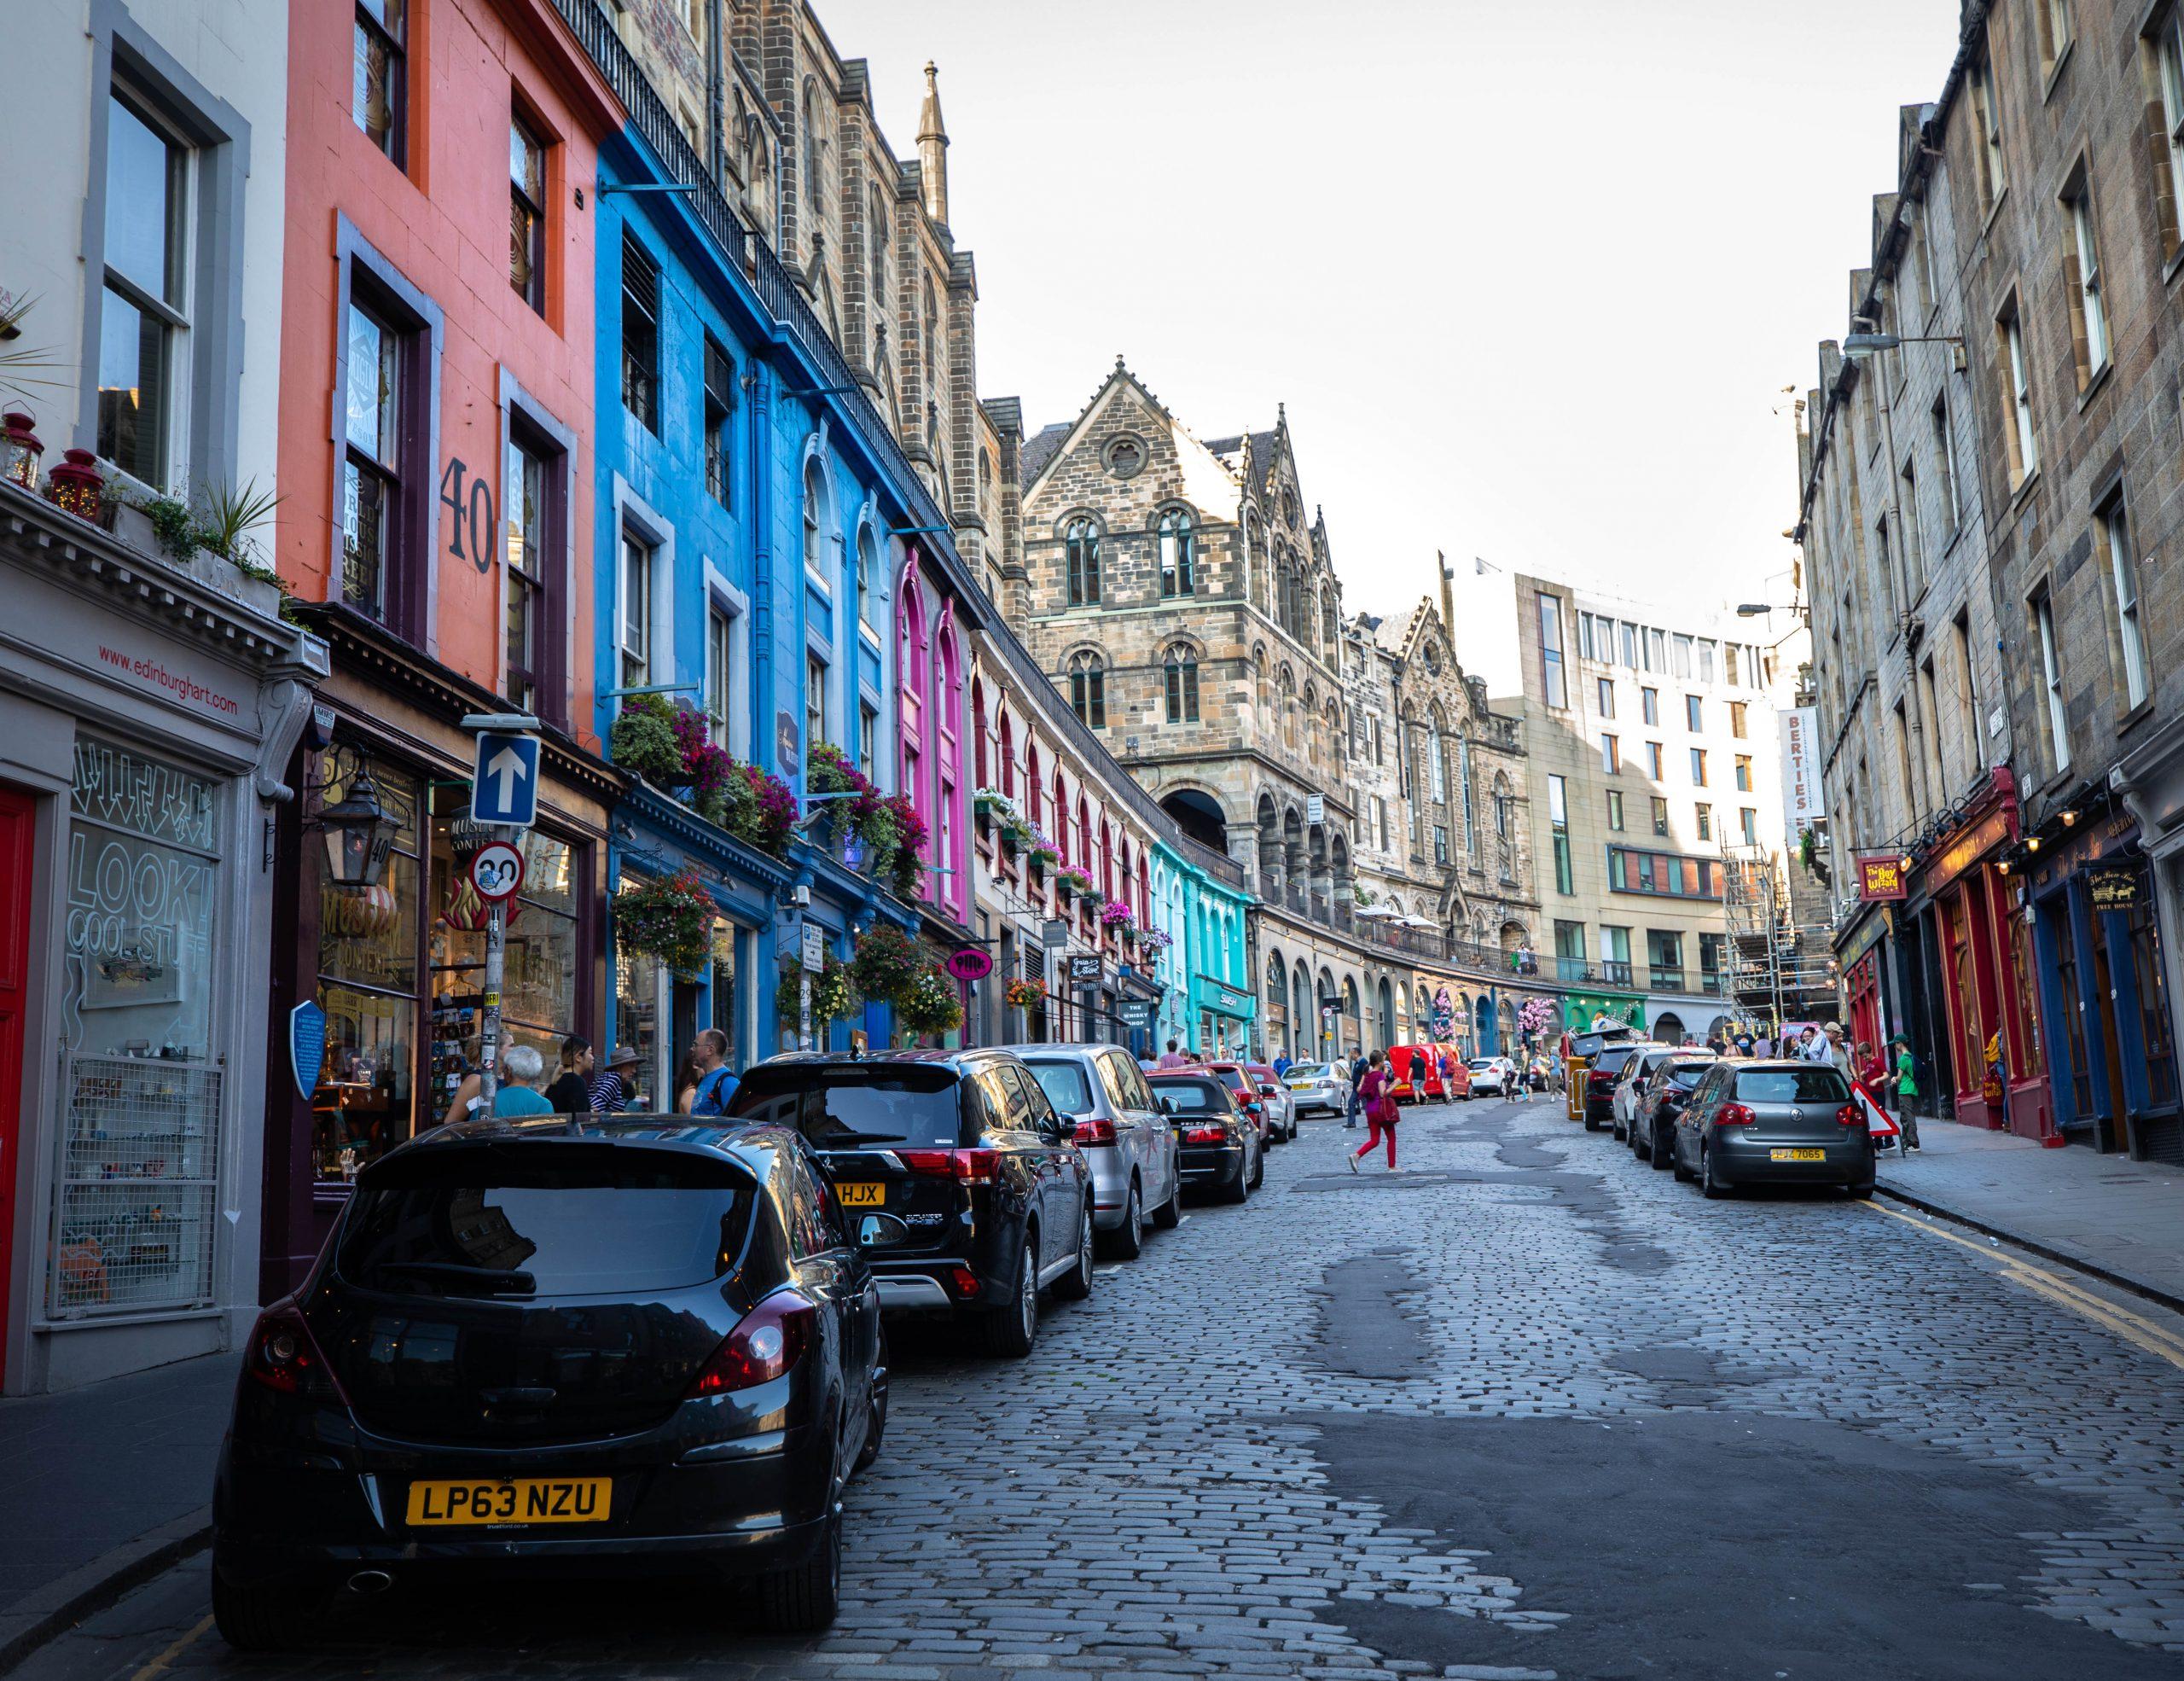 How to Navigate Edinburgh Public Buses, Trains, Trams, Walking, Luxury Travel Guide Scotland by Annie Fairfax